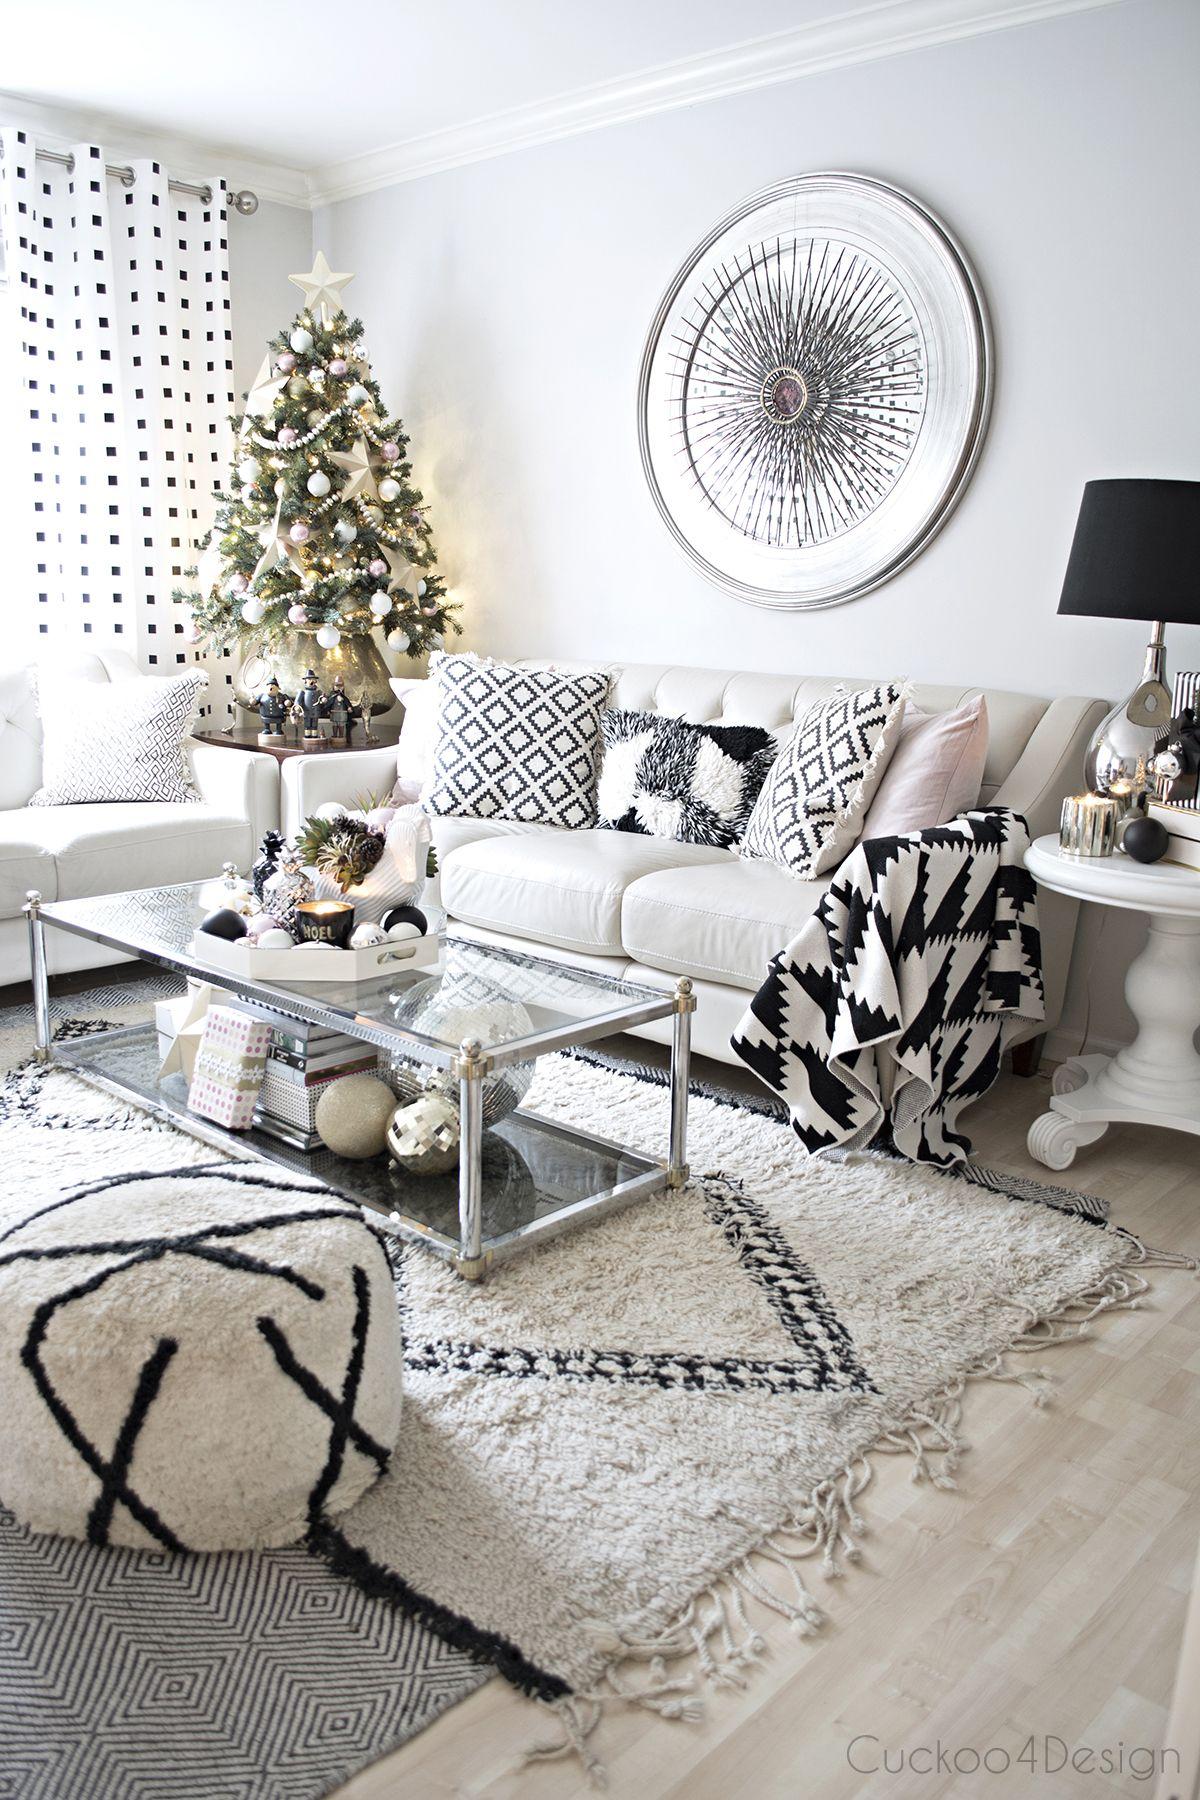 Better Homes and Gardens Christmas Ideas Home Tour | Small christmas ...